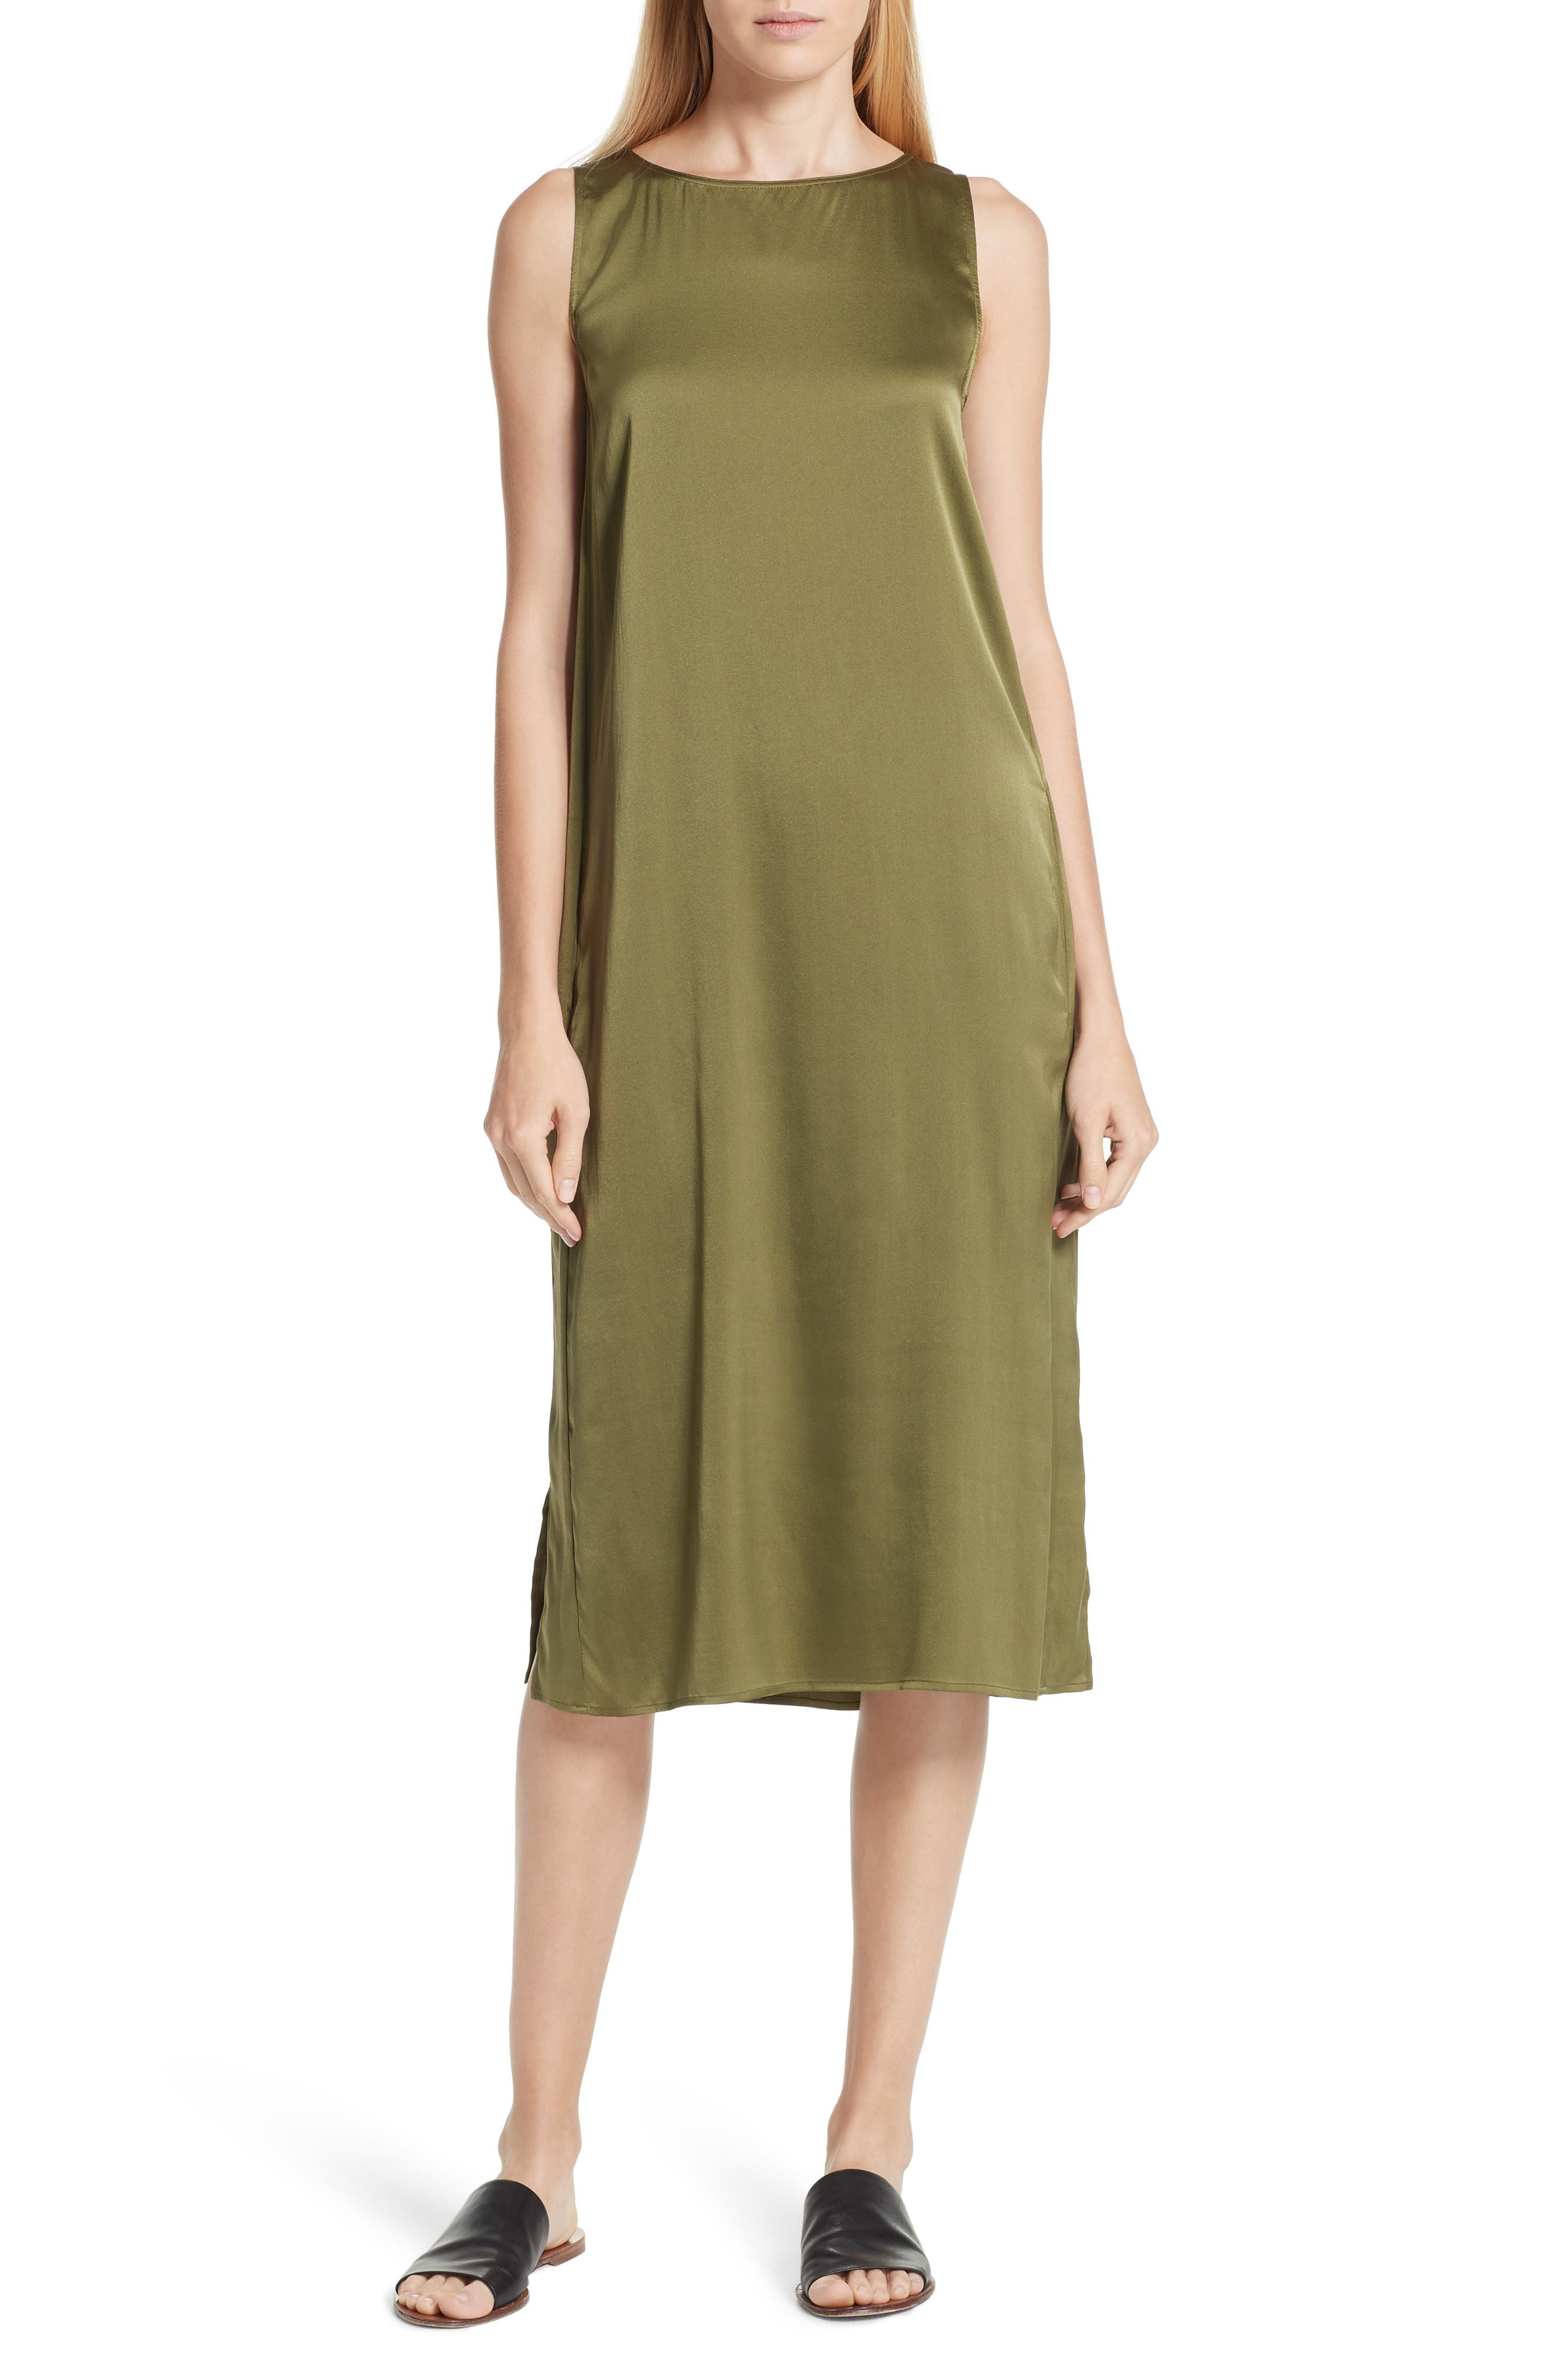 EILEEN FISHER Stretch Silk Tank Dress, Main, color, 301